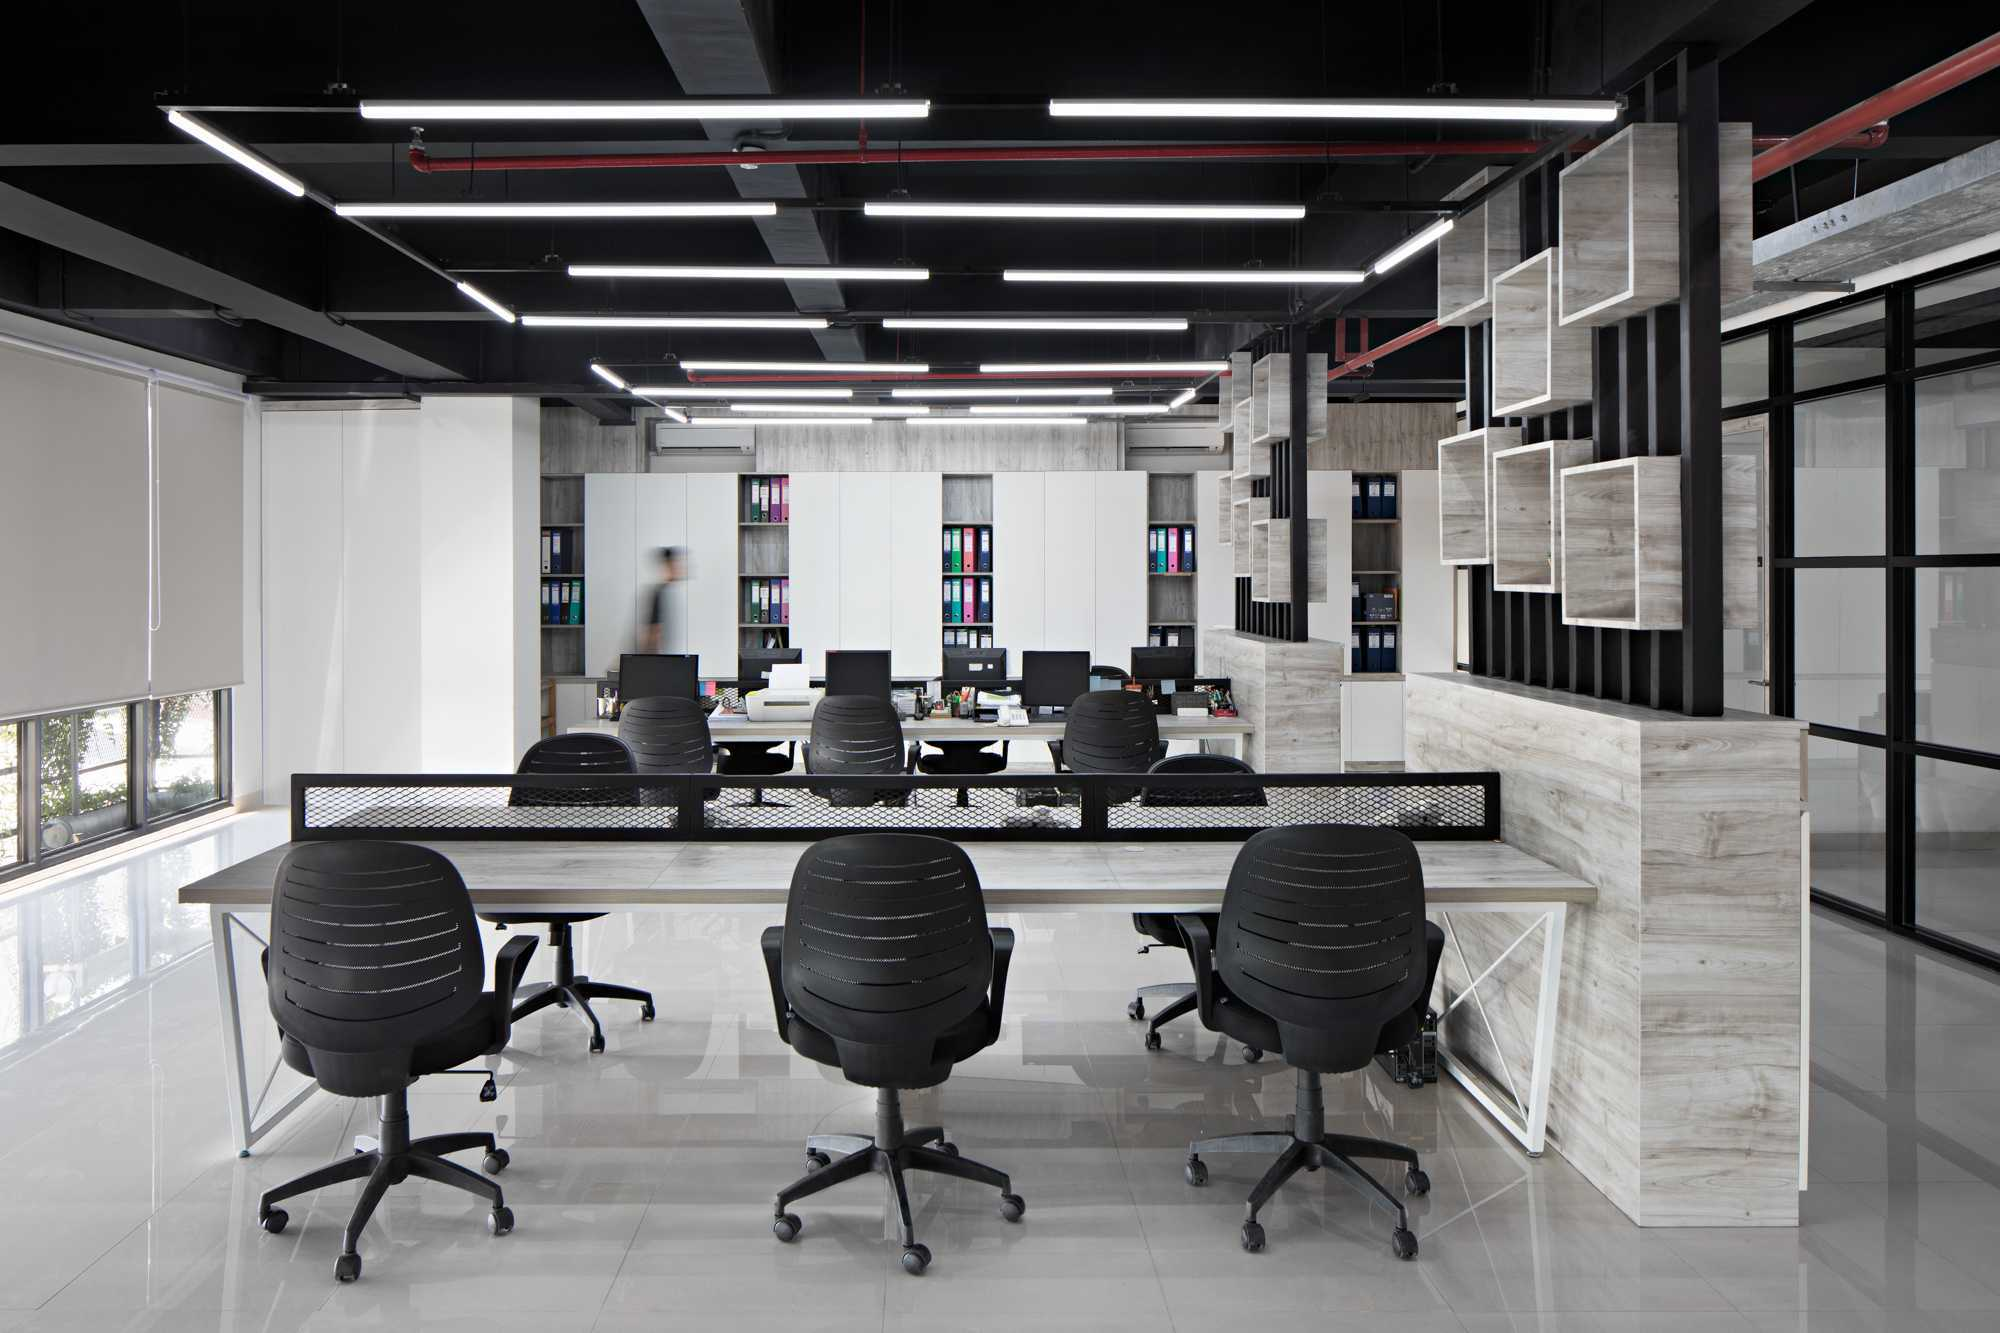 Best Group Design Studio Faber Castell International - Surabaya Surabaya, Kota Sby, Jawa Timur, Indonesia Surabaya, Kota Sby, Jawa Timur, Indonesia Best-Group-Design-Studio-Faber-Castell-International-Surabaya  88499